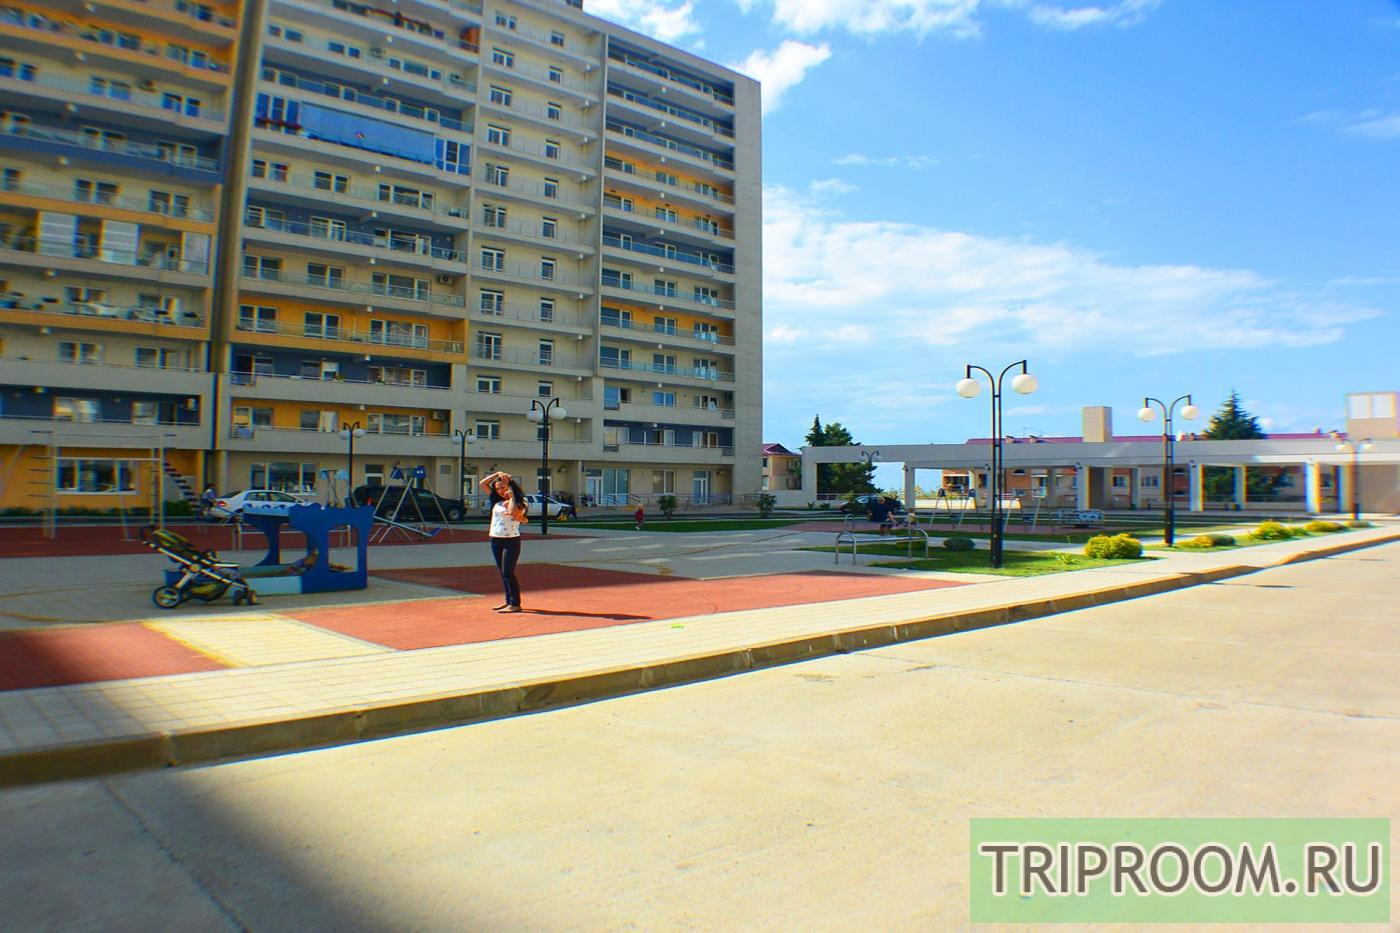 1-комнатная квартира посуточно (вариант № 26990), ул. Кирпичная улица, фото № 24